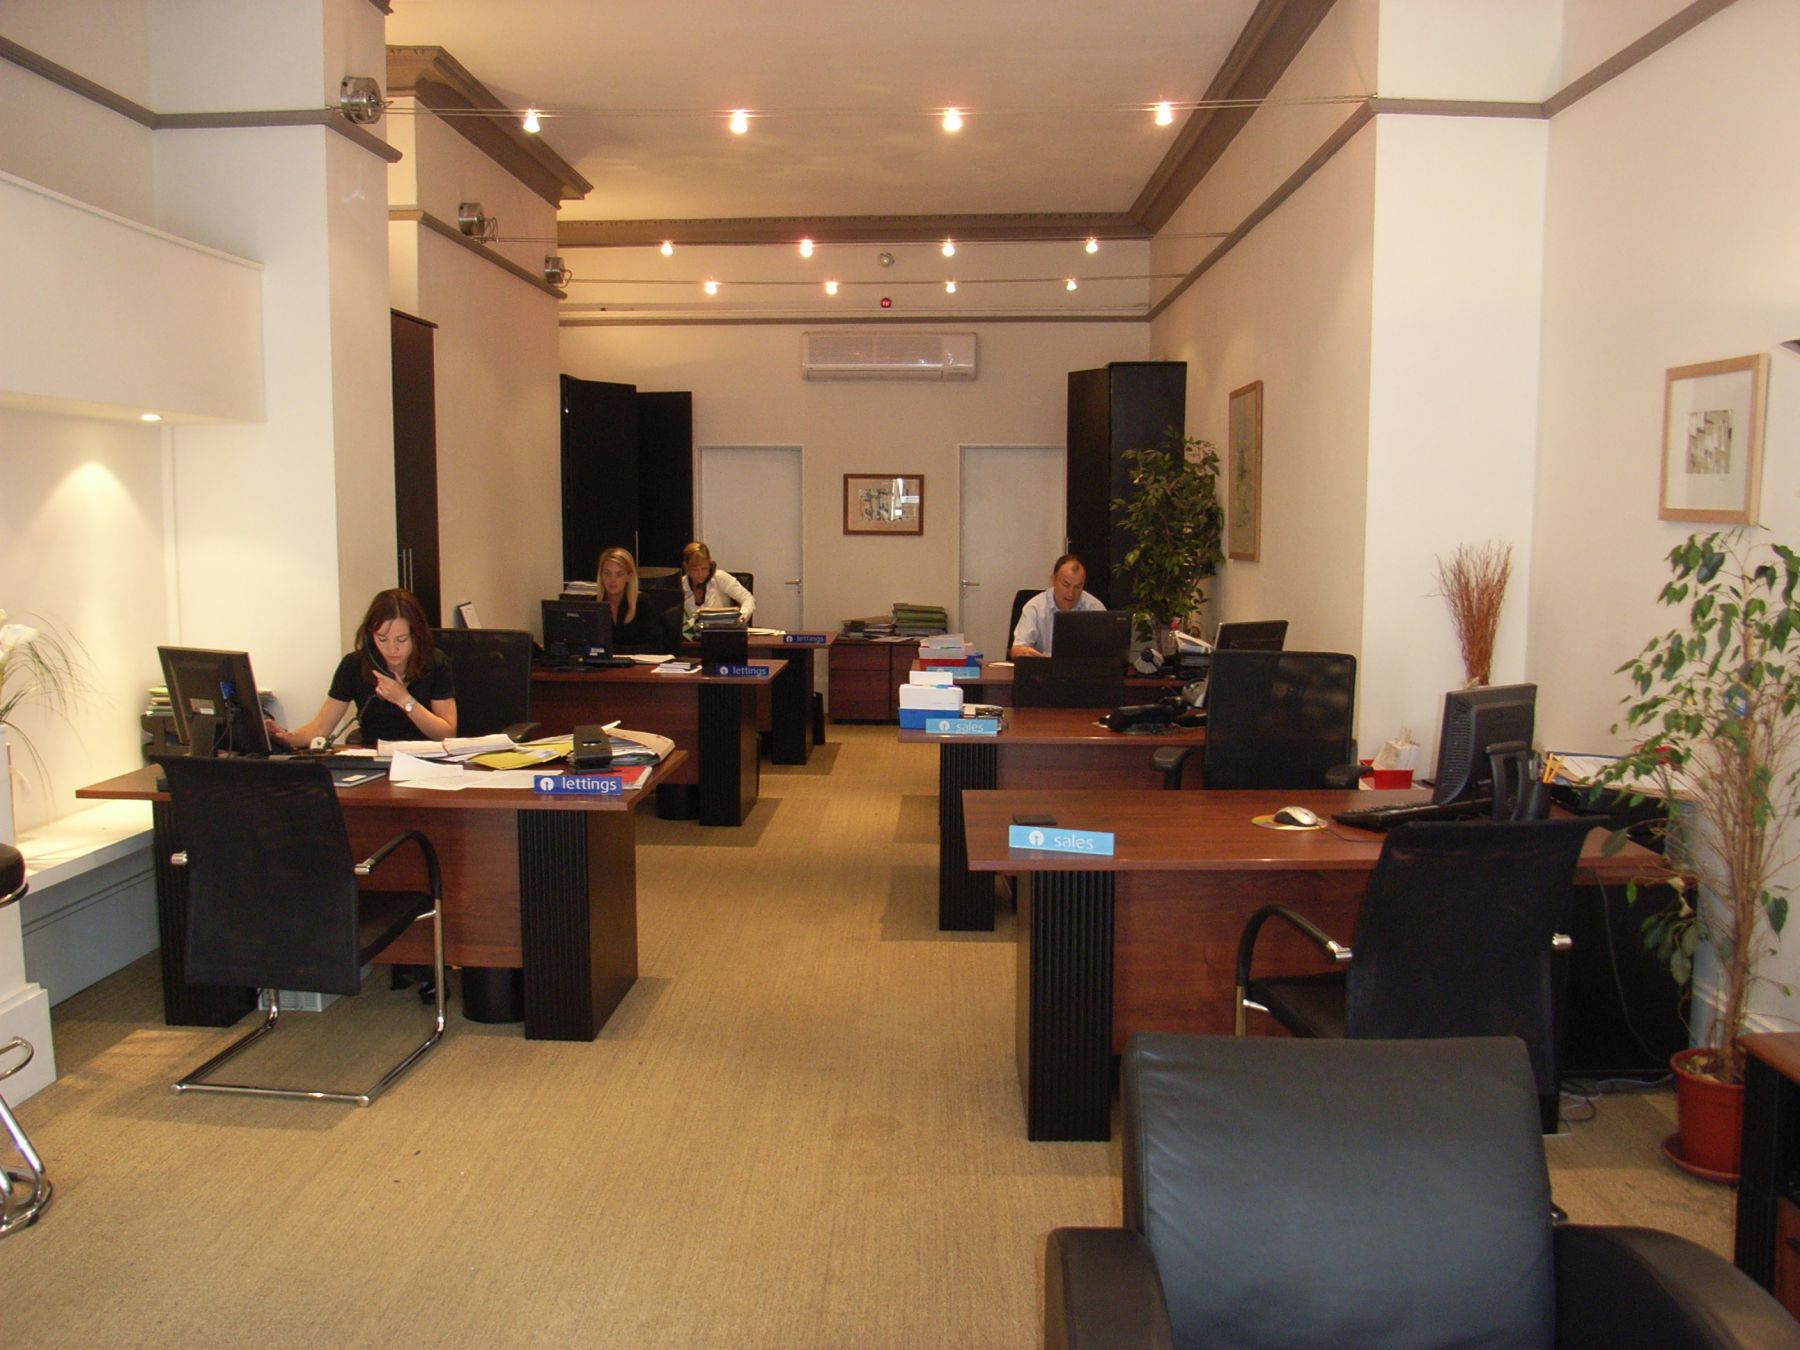 refurbished office